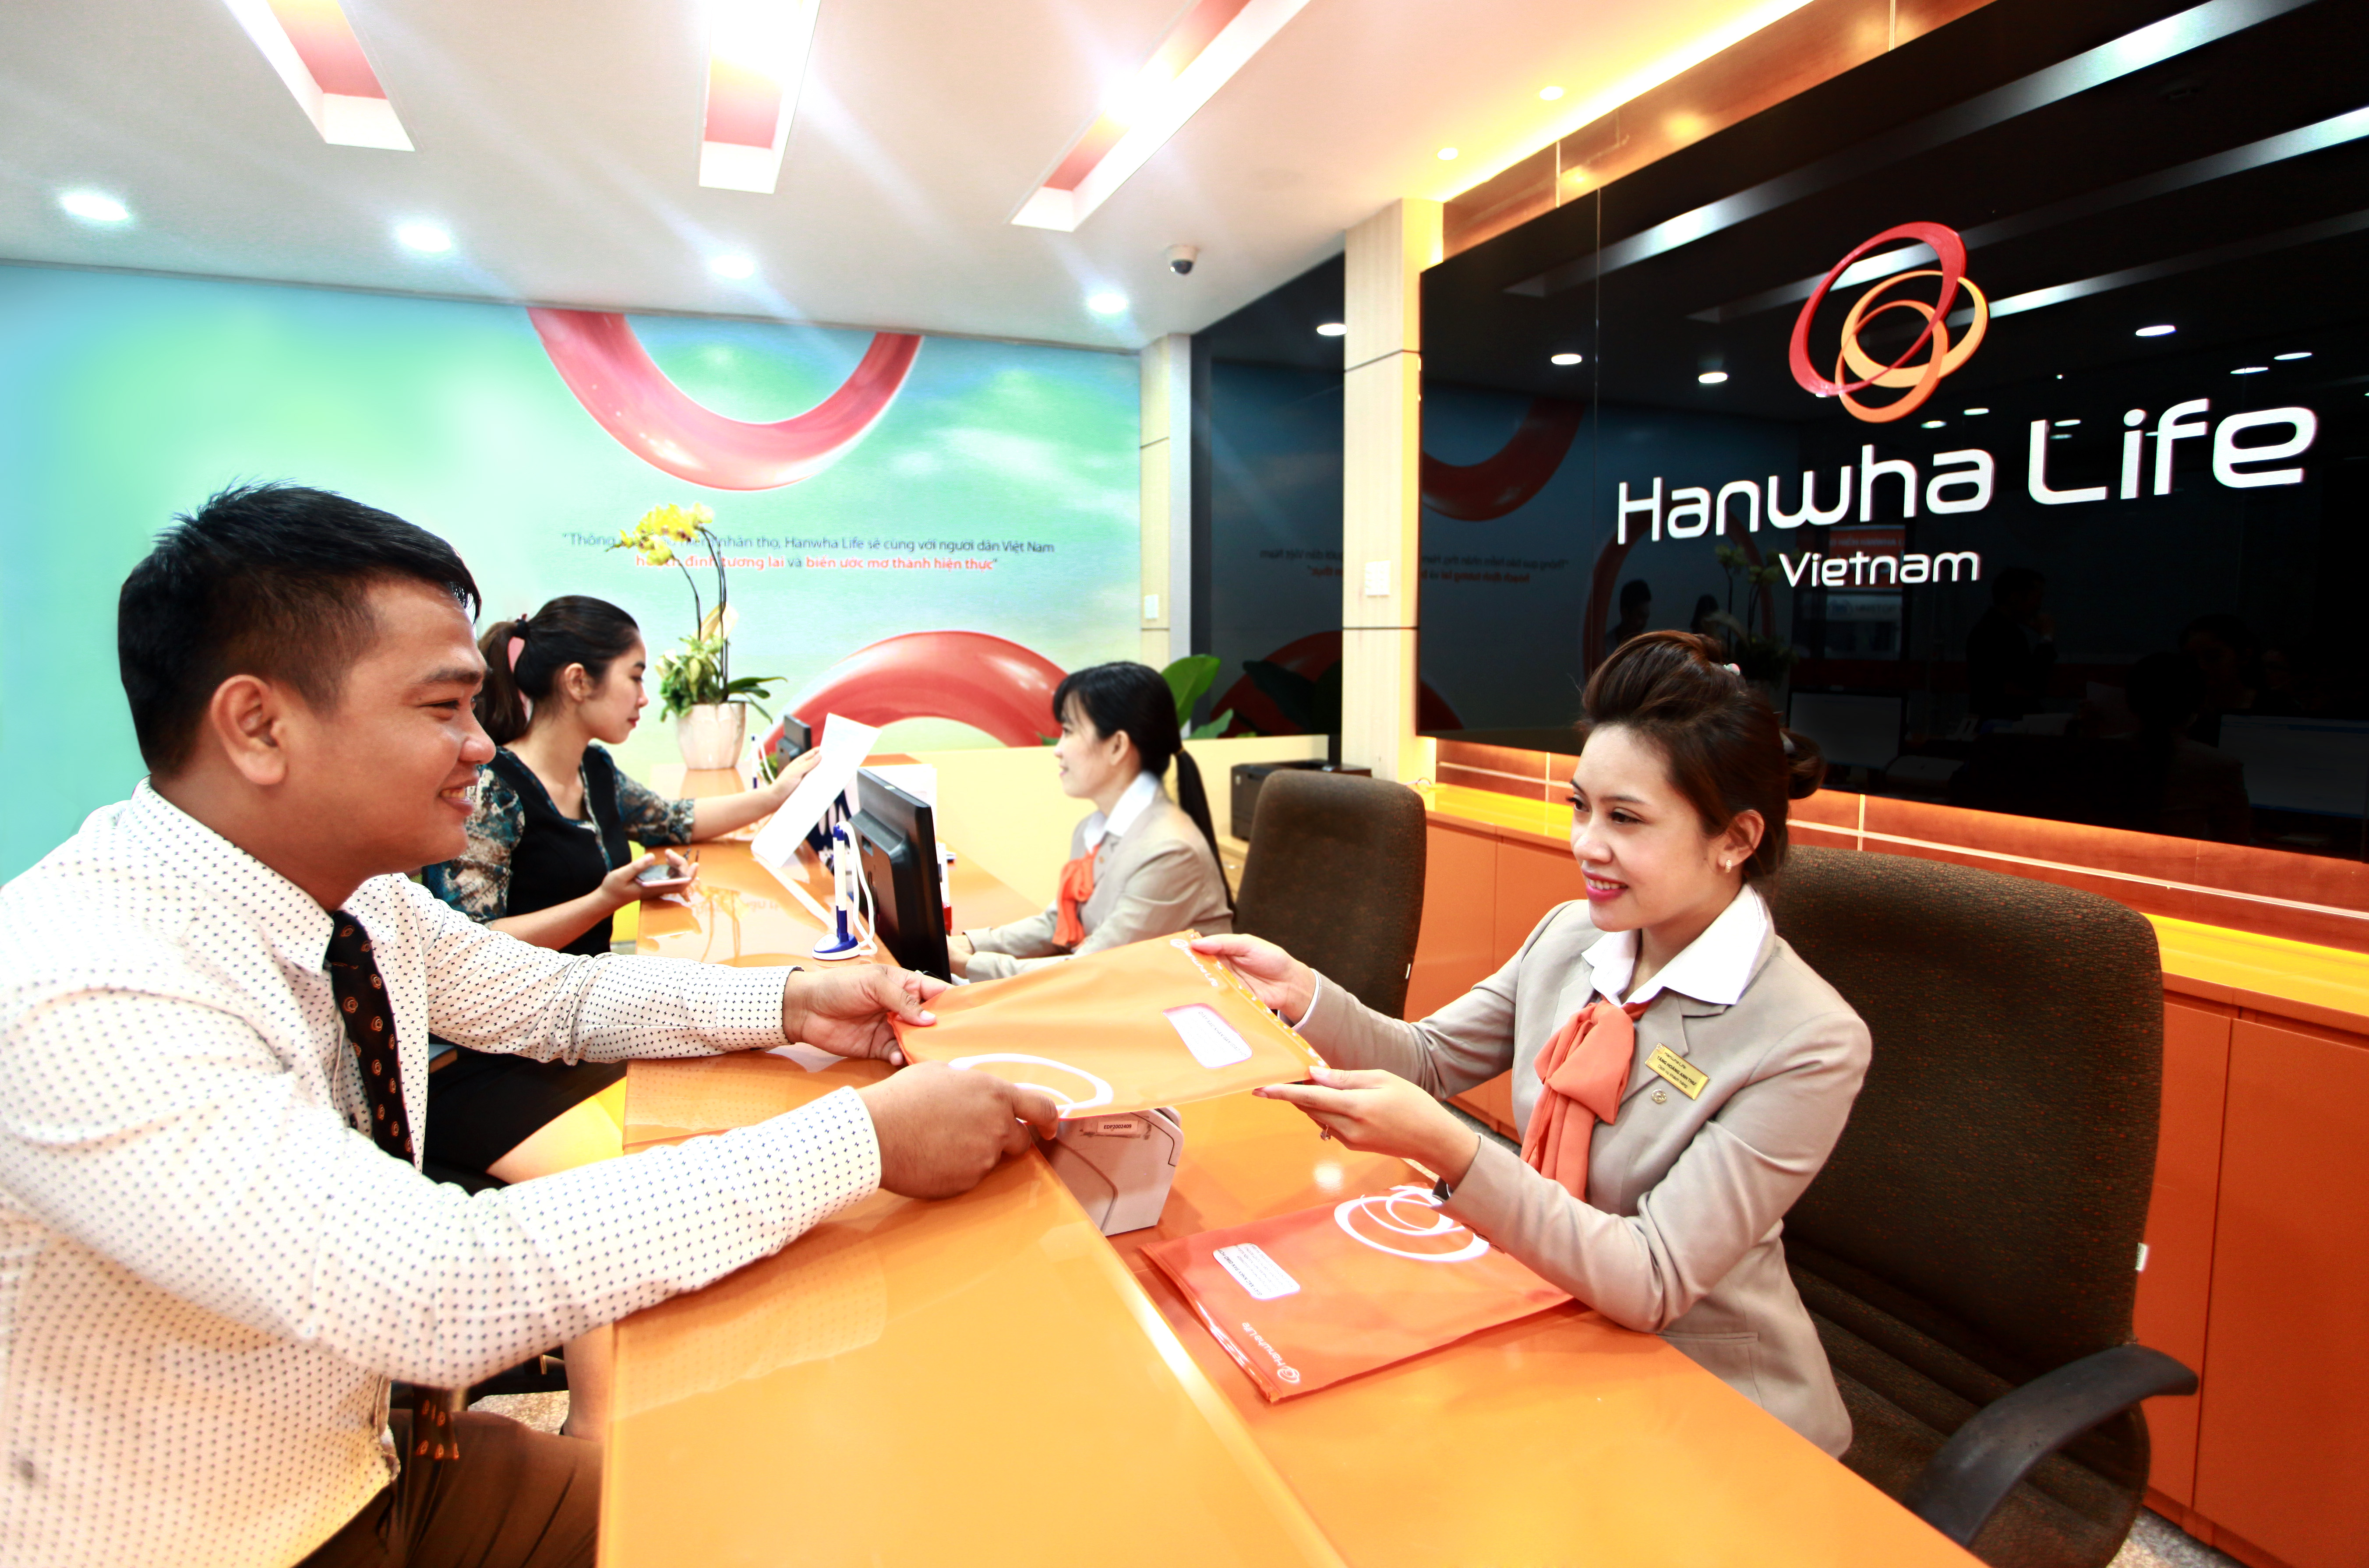 hanwha life vietnam reports outstanding third quarter results